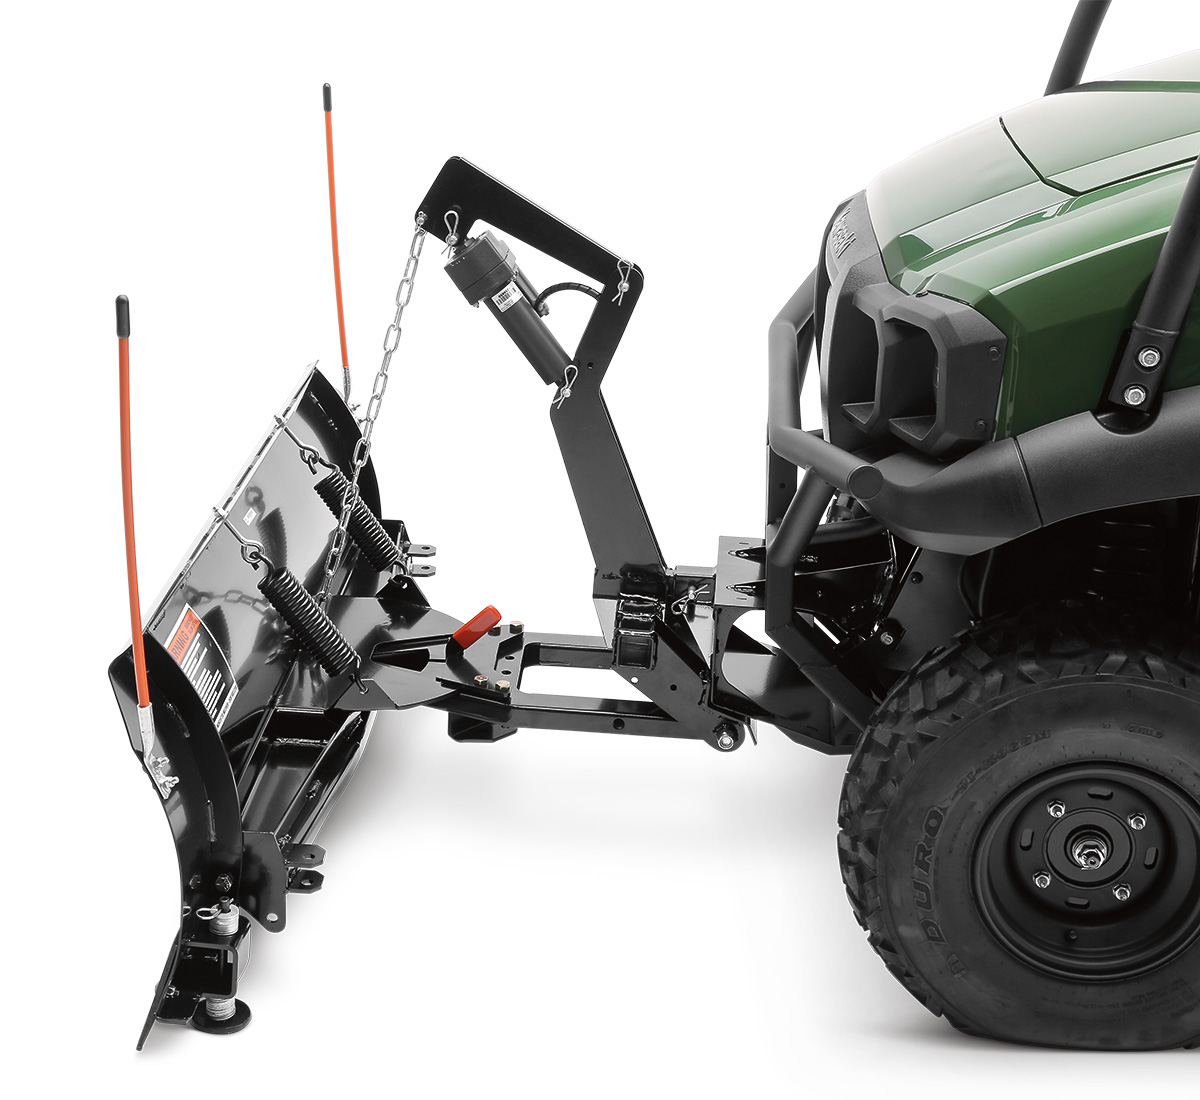 2510 Kawasaki Mule Snow Plow 3010 Wiring Diagram Side 1200x1100